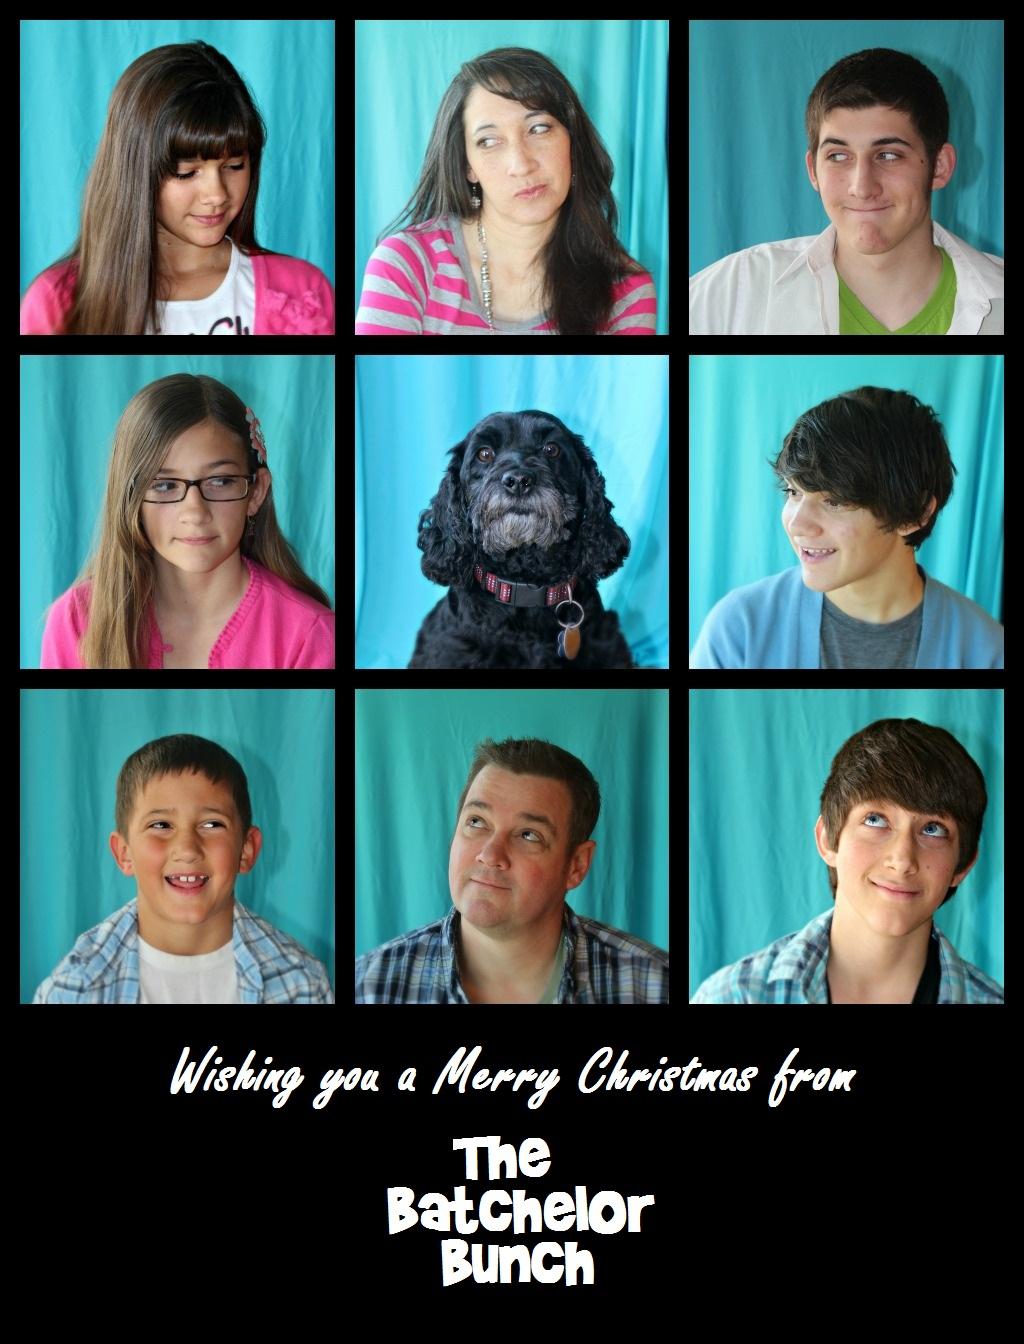 Brady Bunch Christmas Card.Batchelors Way Merry Christmas